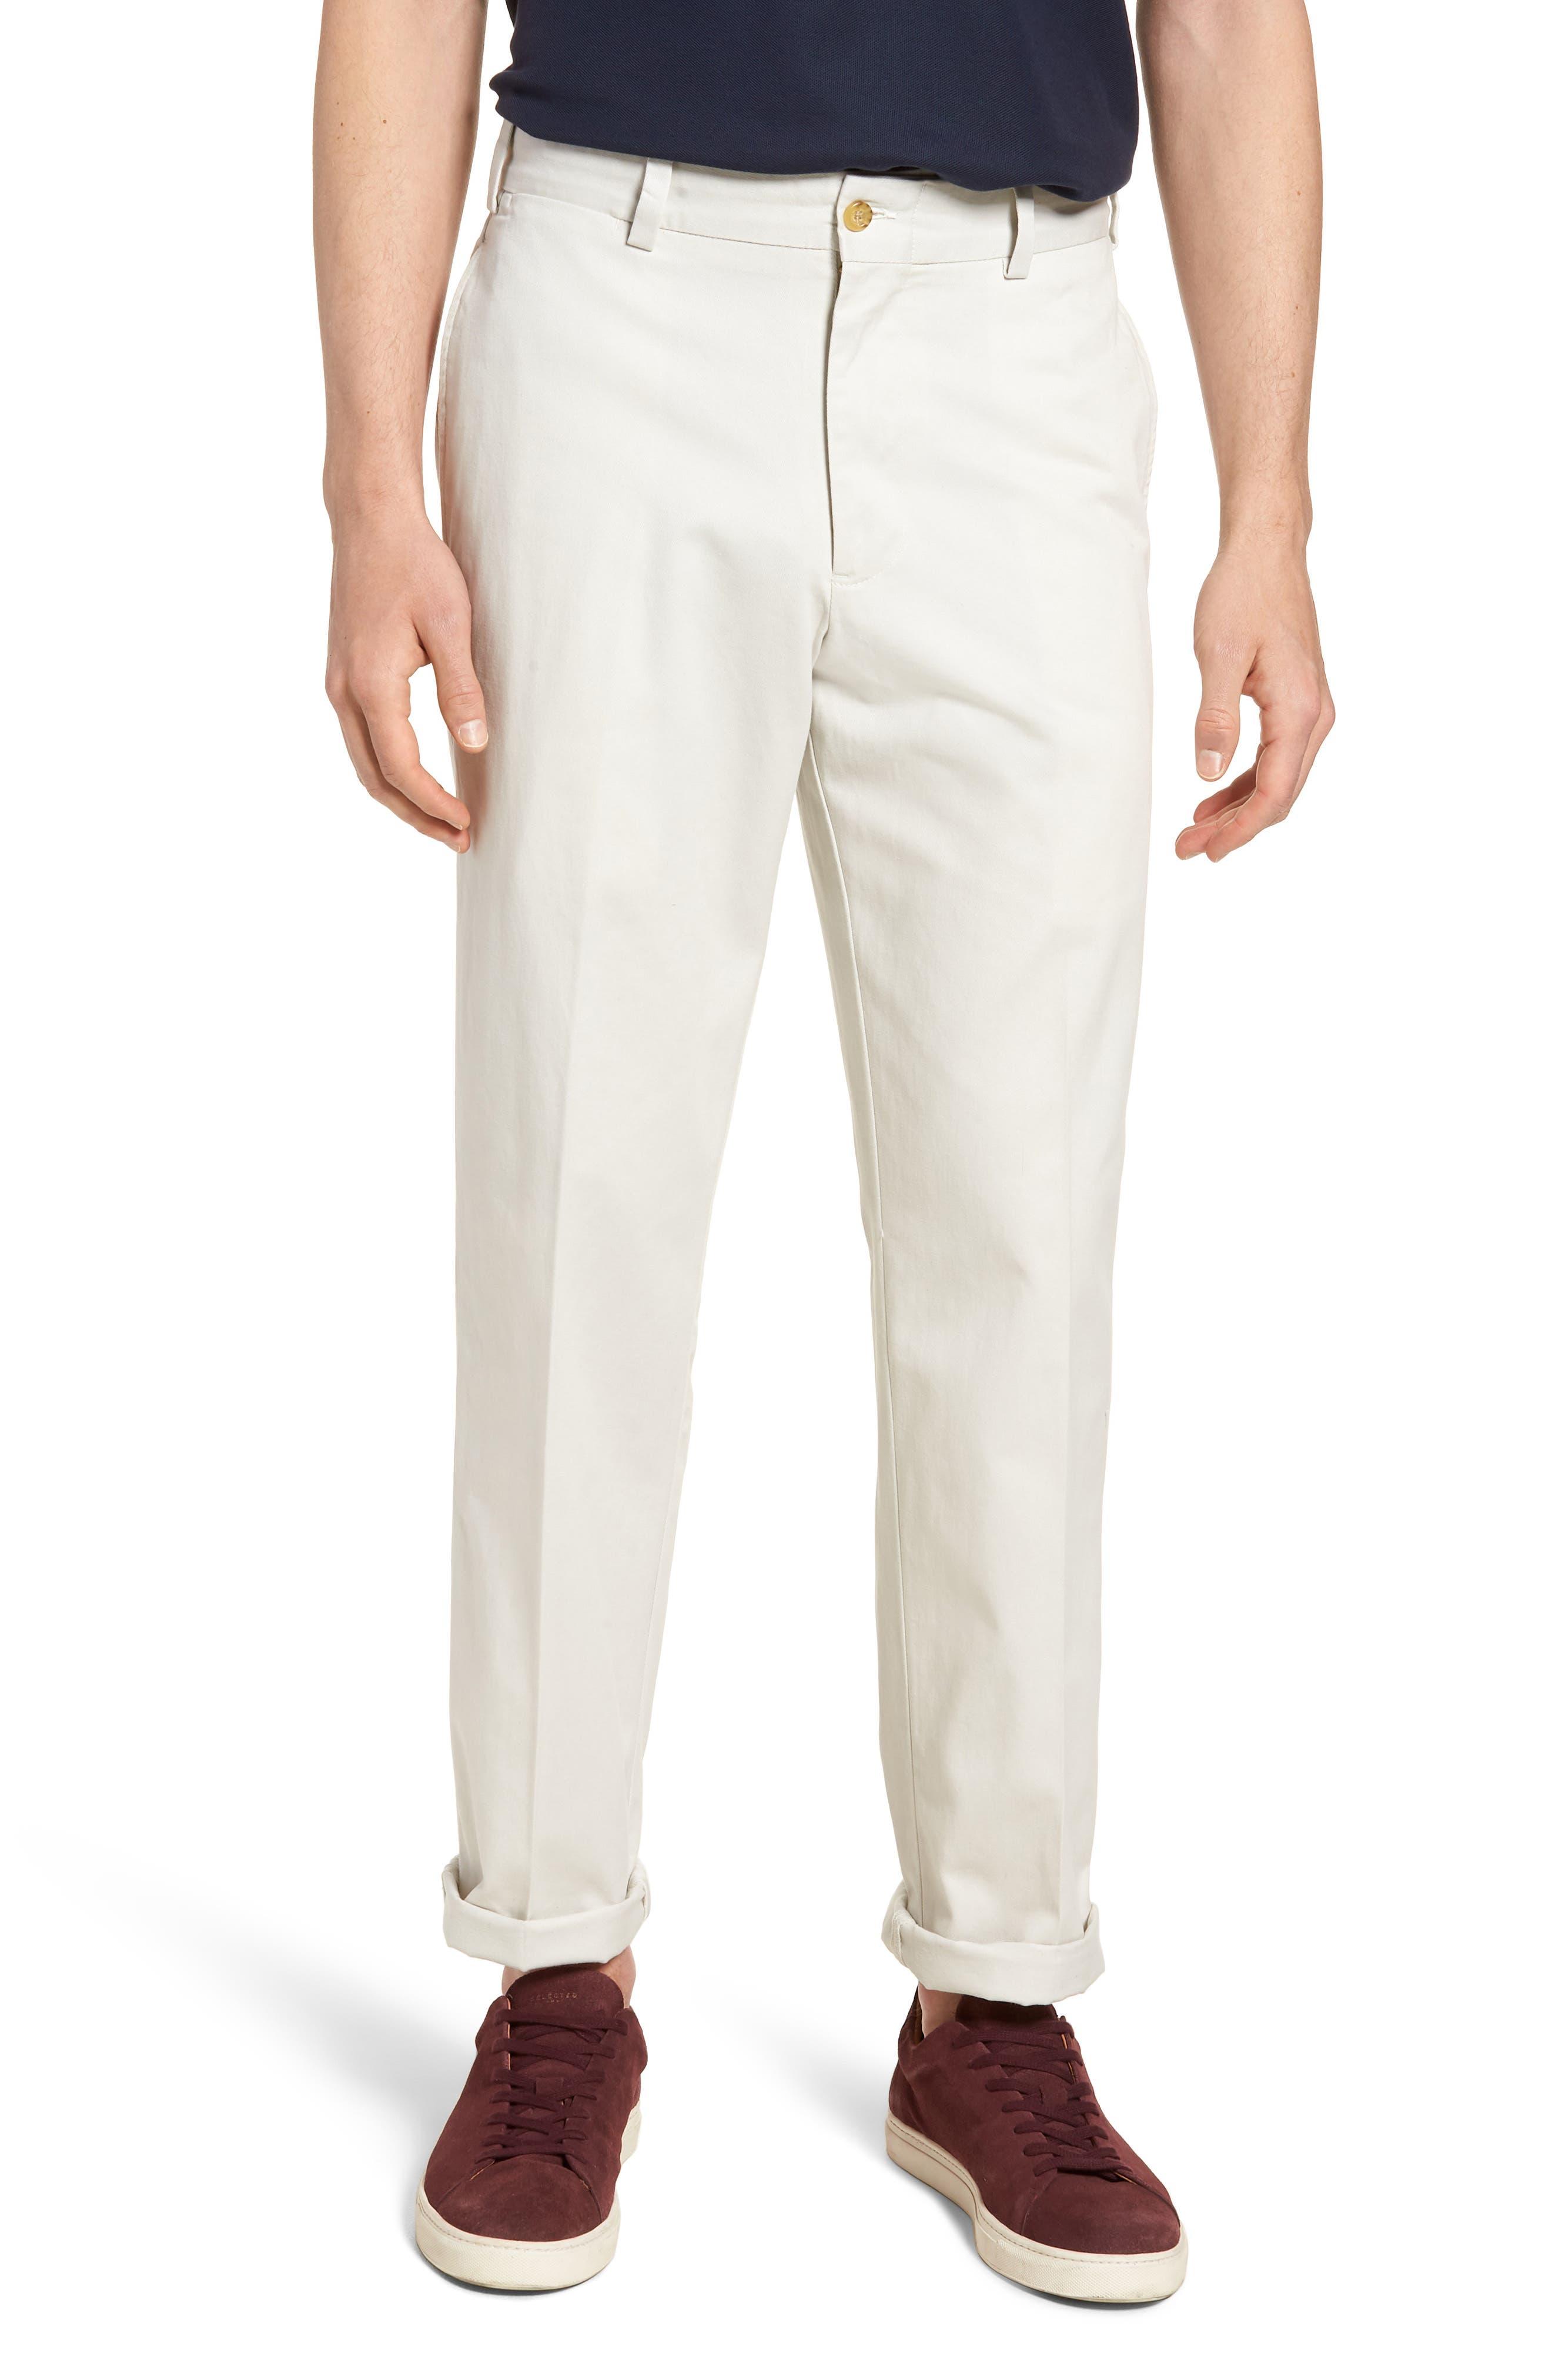 M2 Classic Fit Vintage Twill Flat Front Pants,                             Main thumbnail 1, color,                             270